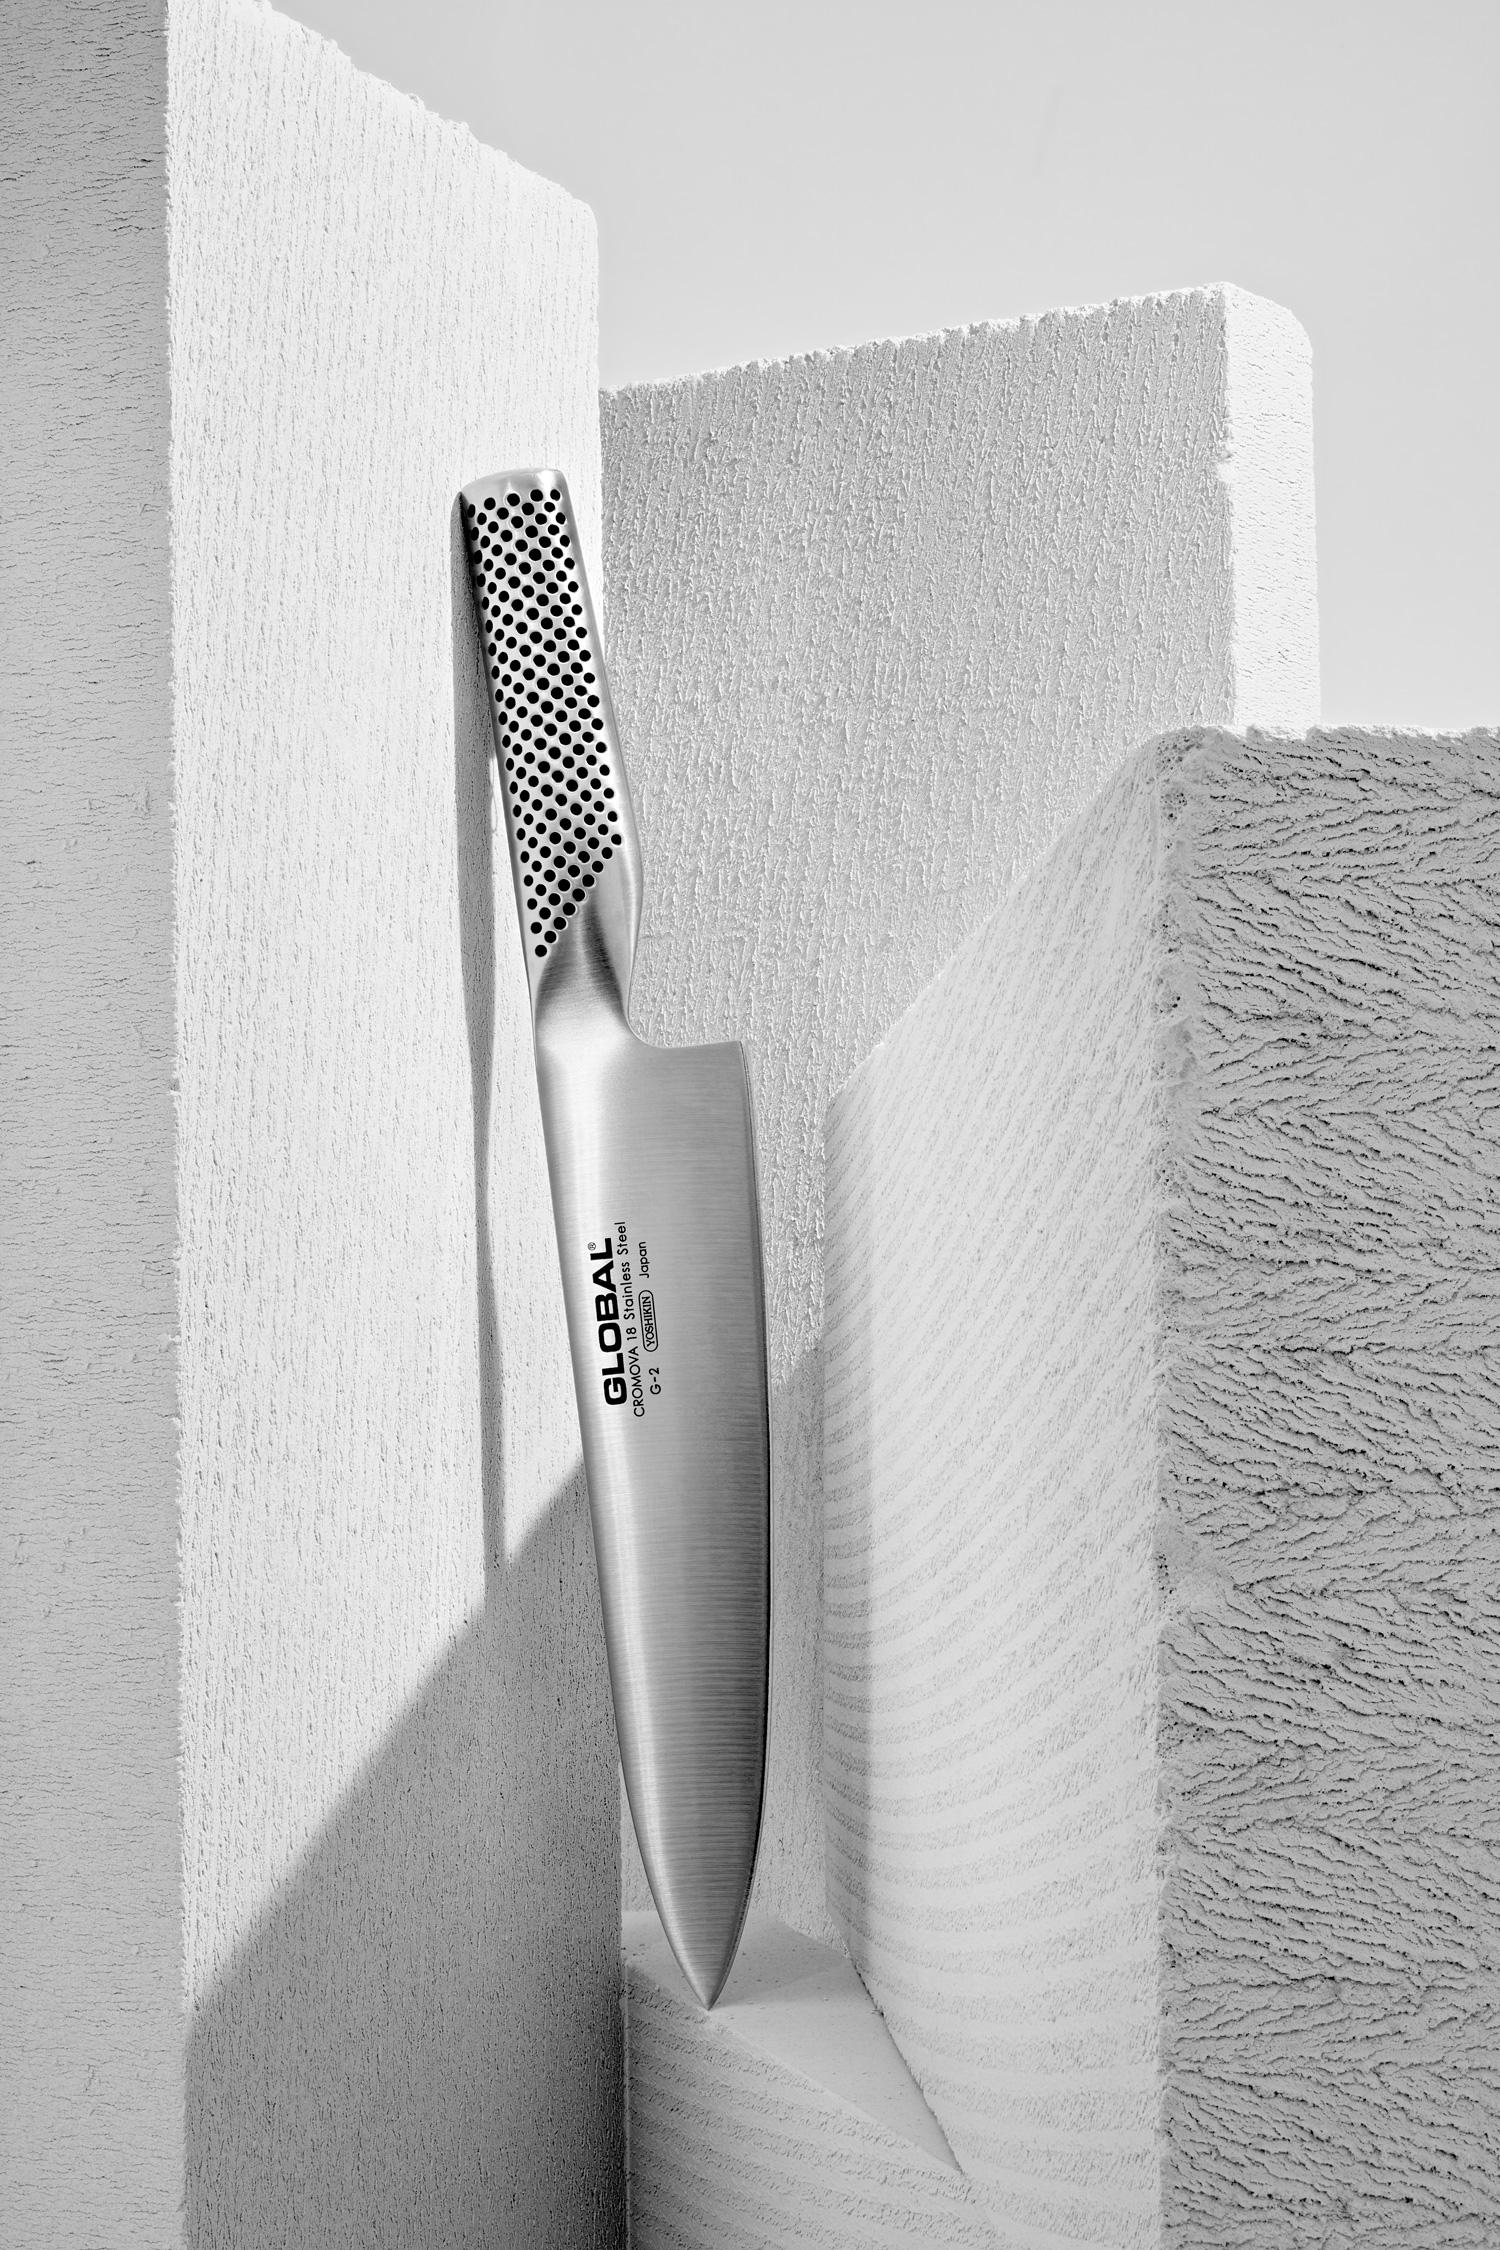 Jurian-Kriebel_Global-Knives_1.jpg